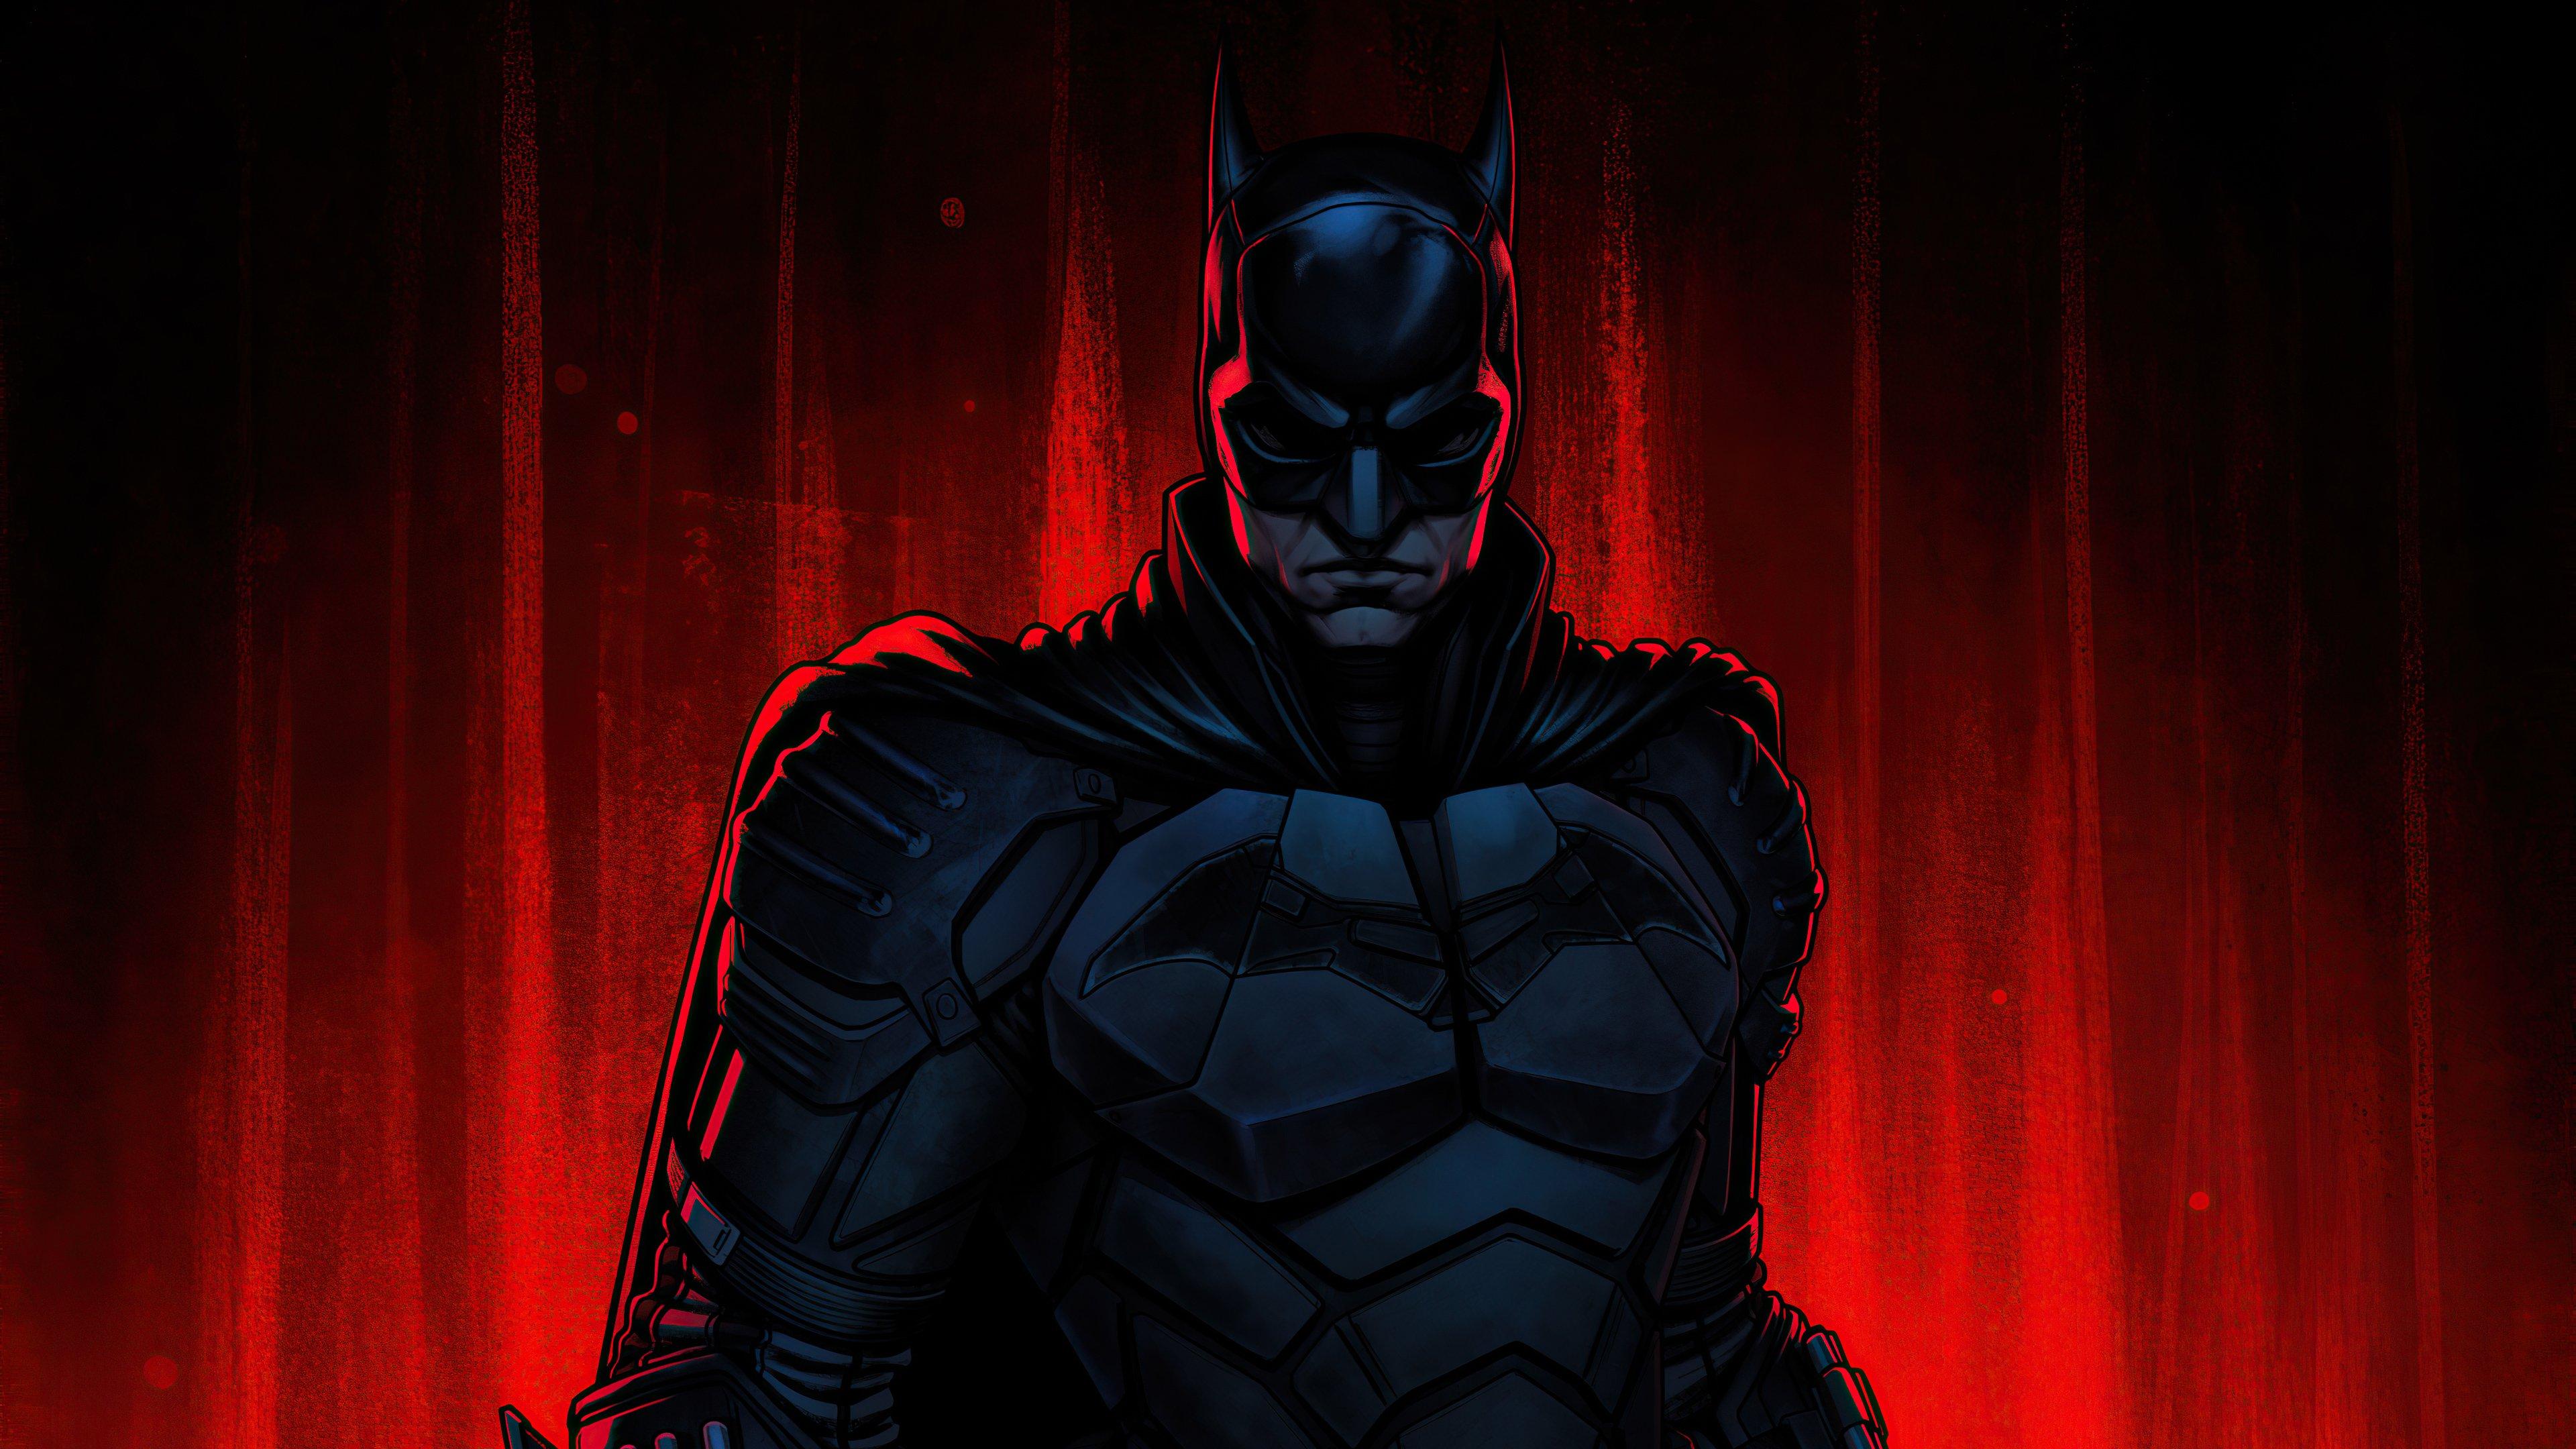 Fondos de pantalla The Batman con fondo rojo